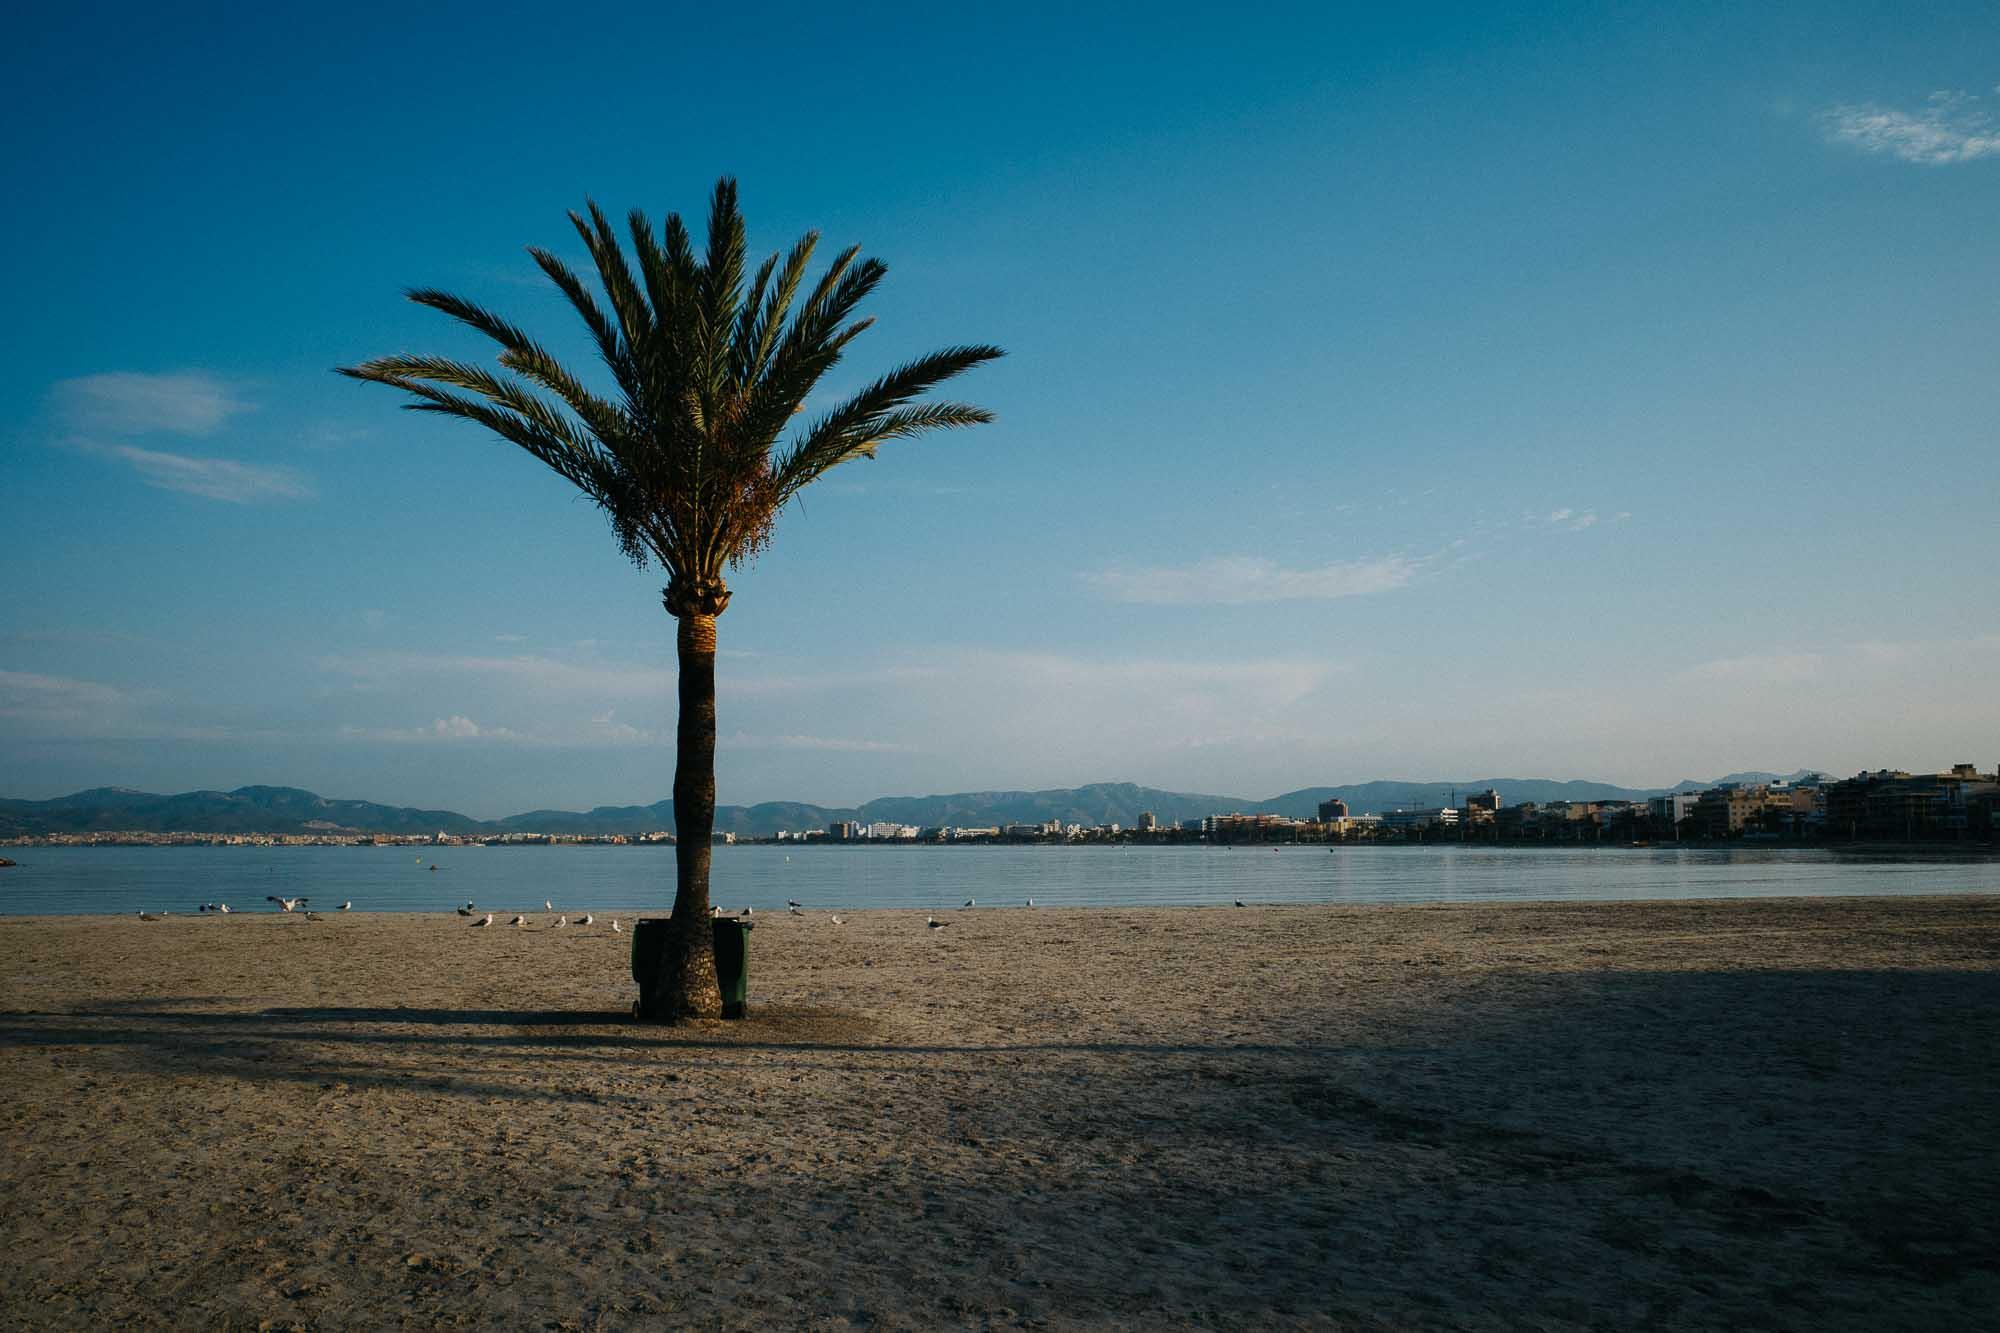 24 hours at the beach Martin U Waltz